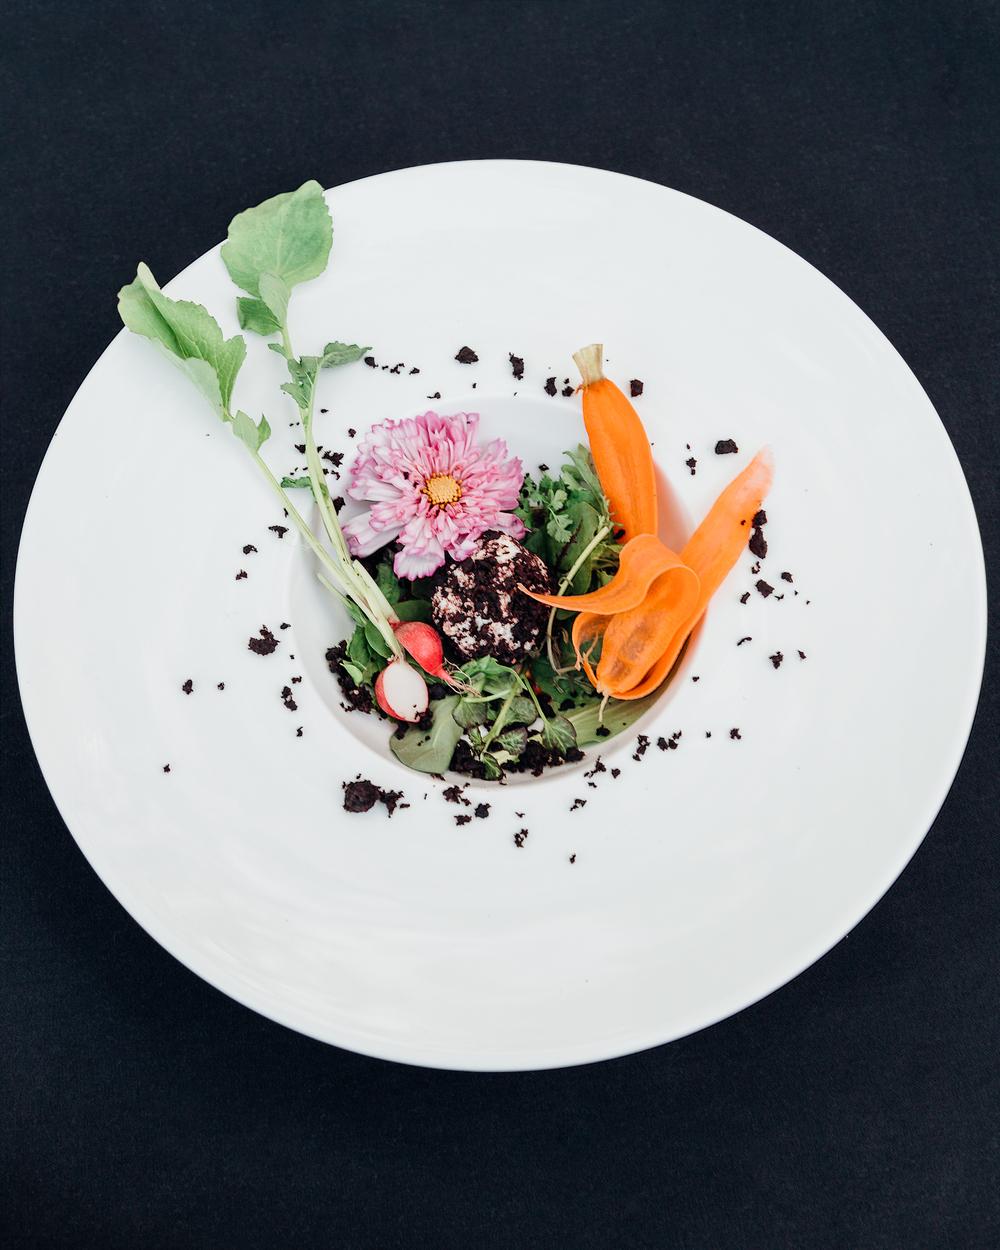 Shaved Baby Vegetable Salad